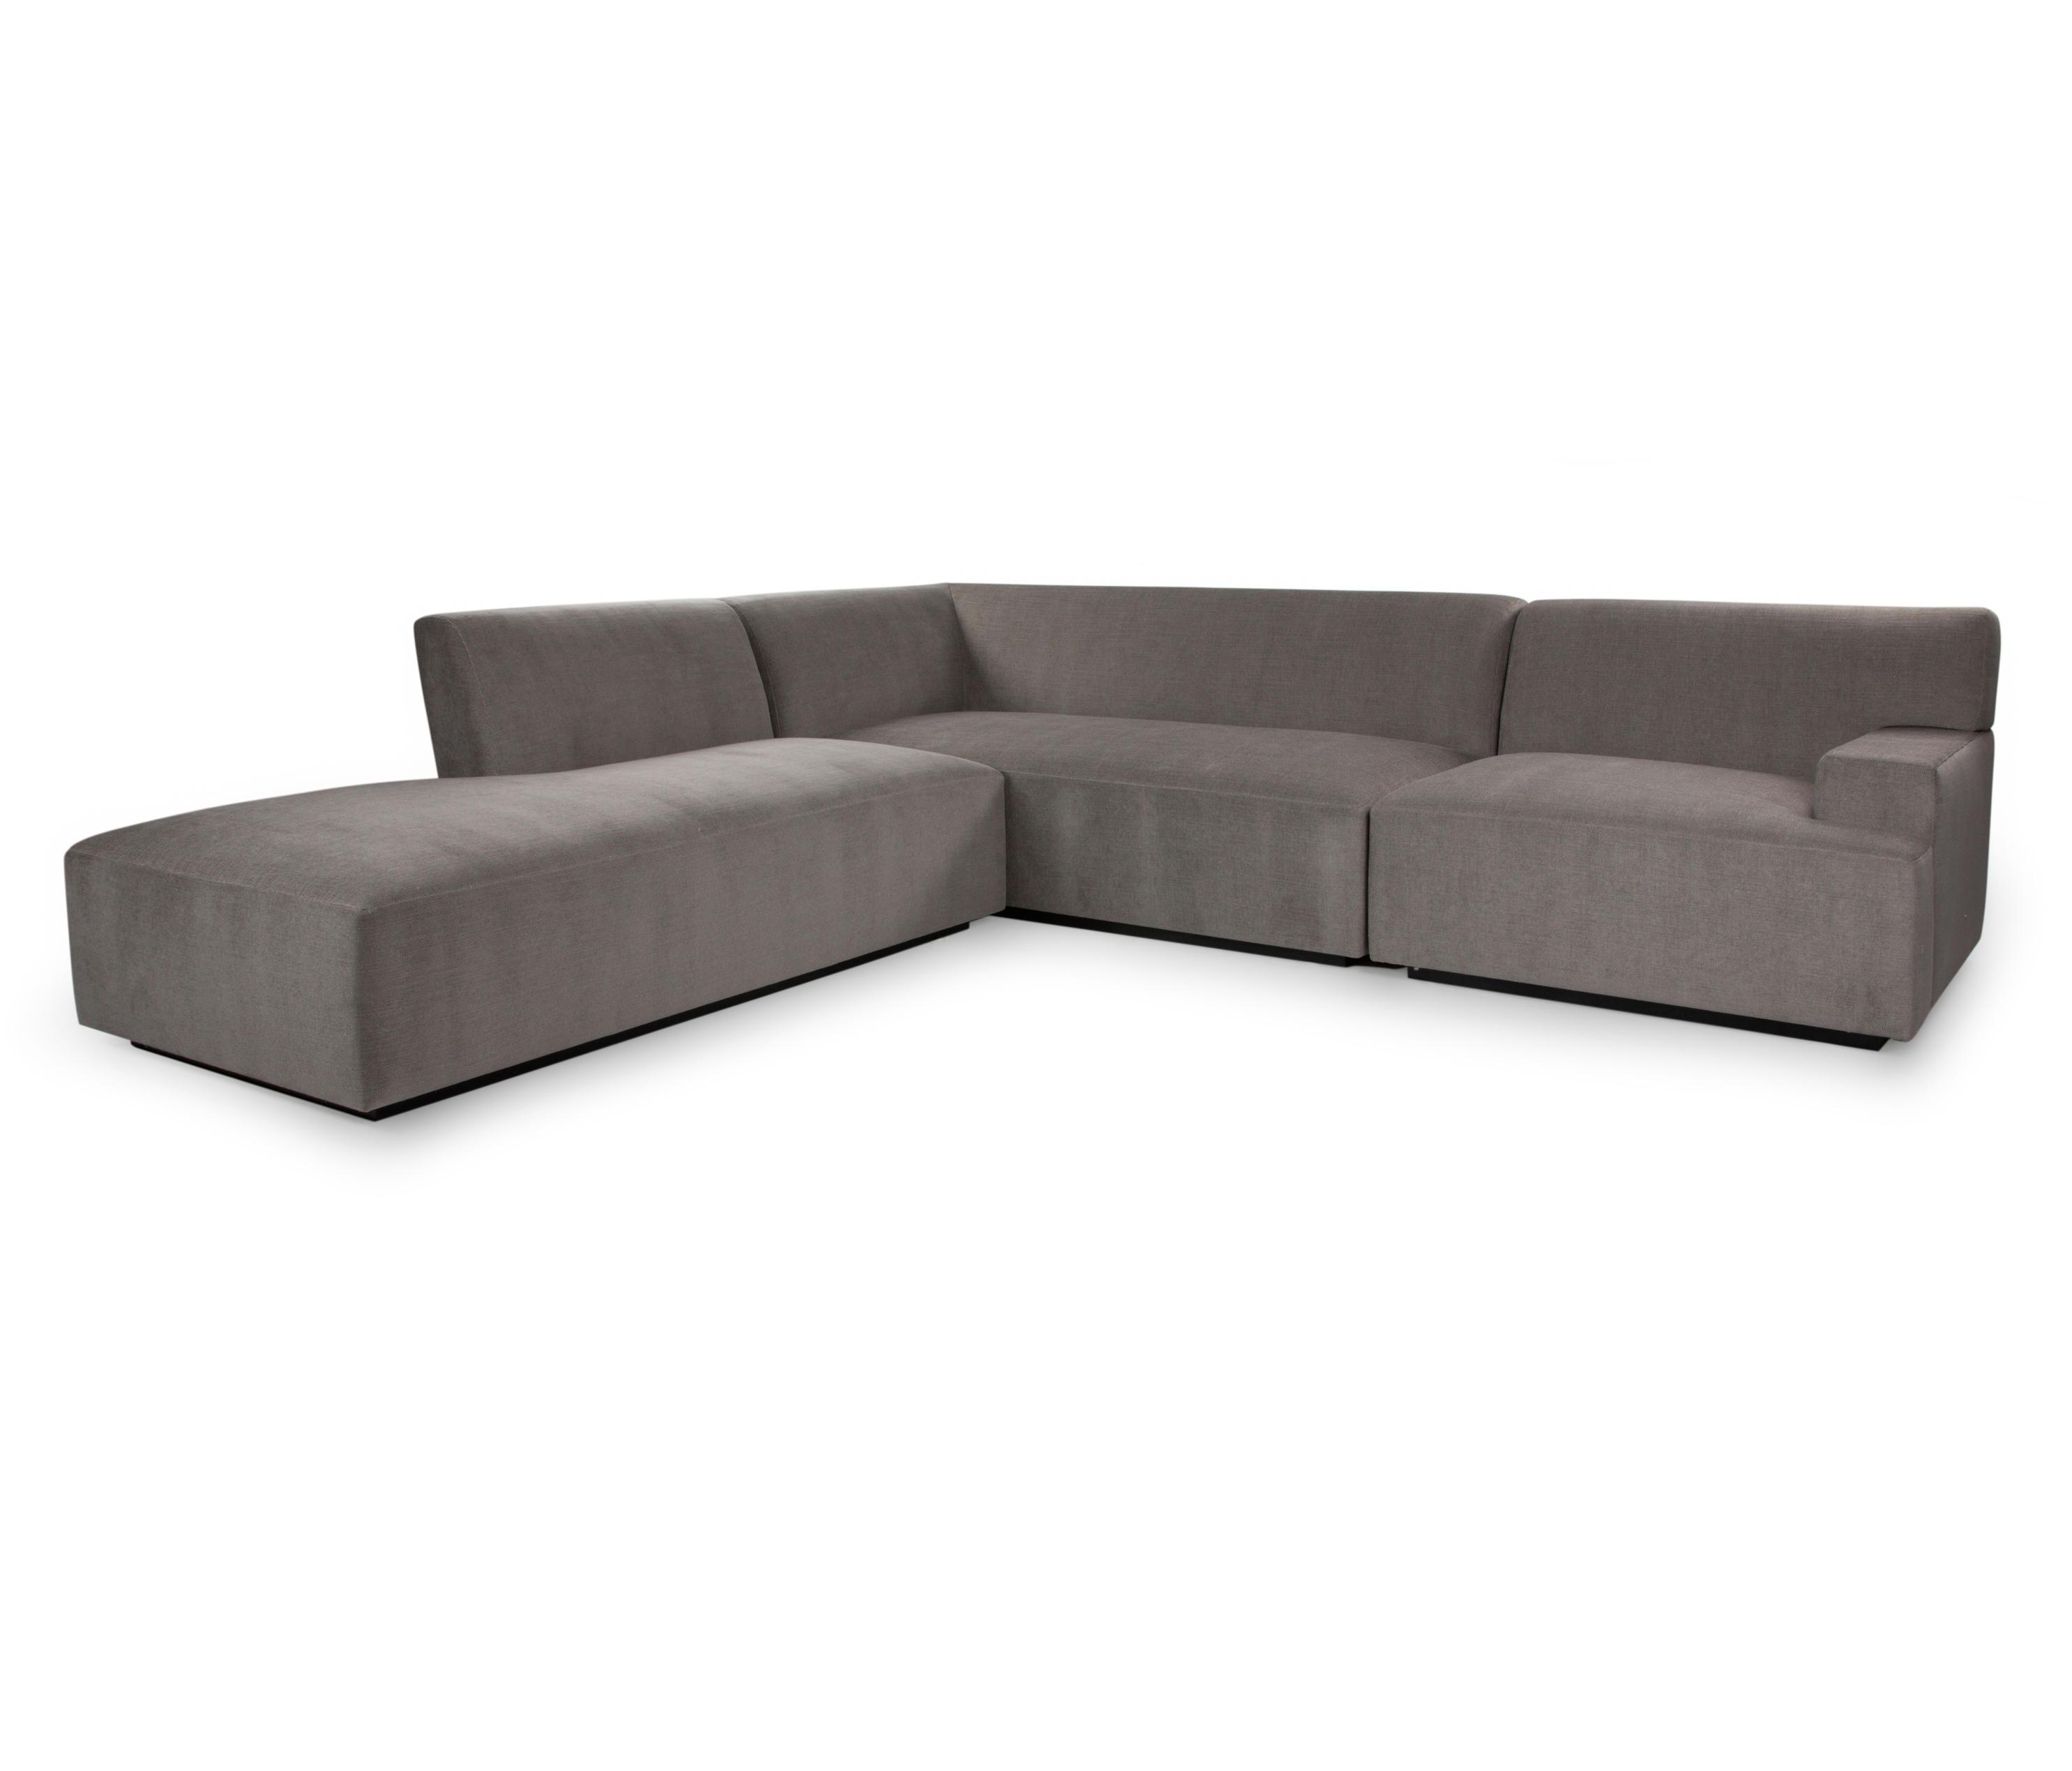 modular sofas  research and select the sofa  chair company ltd  - riley modular sofa  sofas  the sofa  chair company ltd